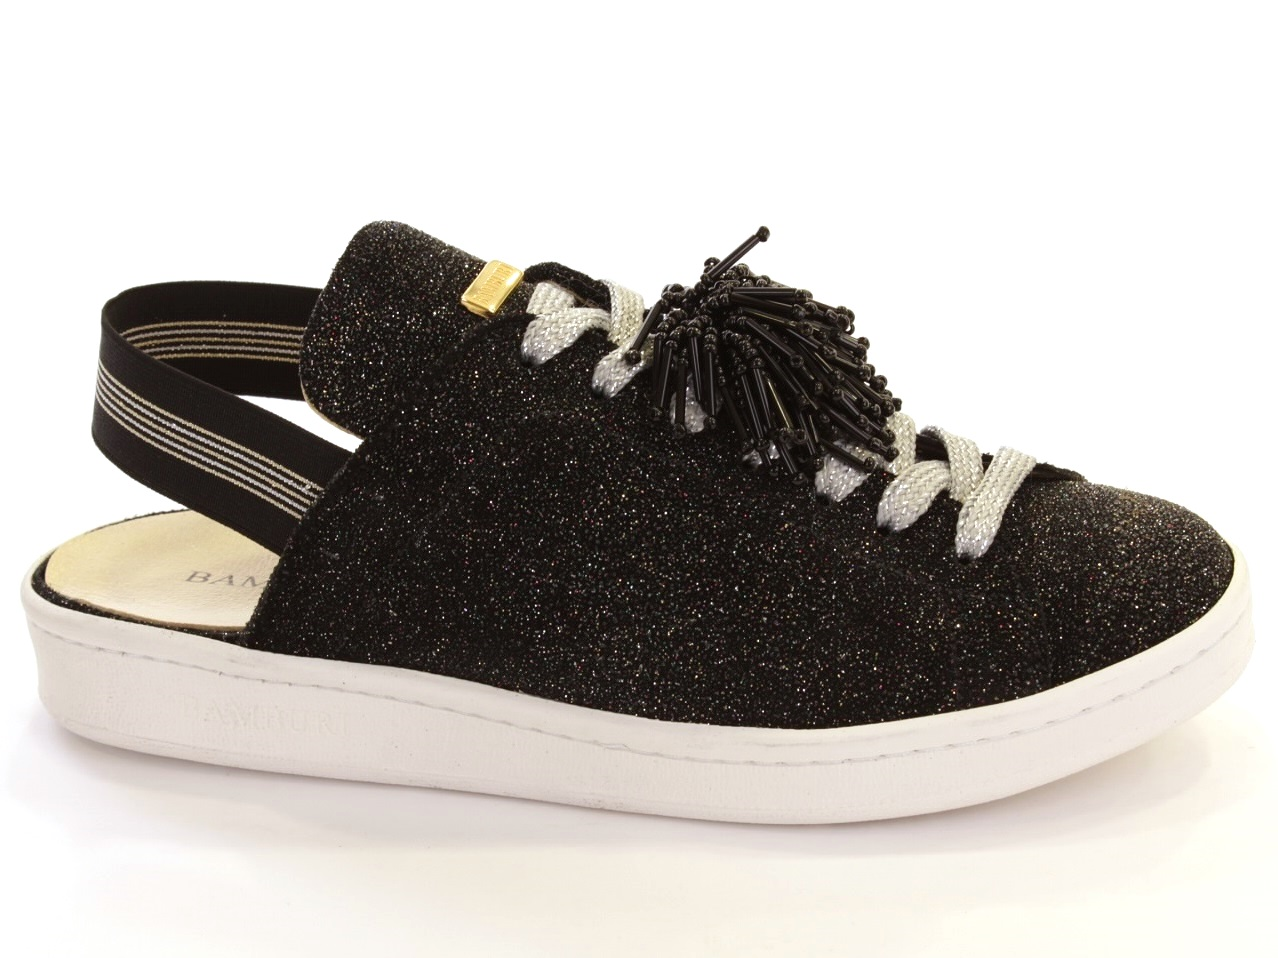 Sneakers and Espadrilles Bamburi - 653 BGARDENMA 11